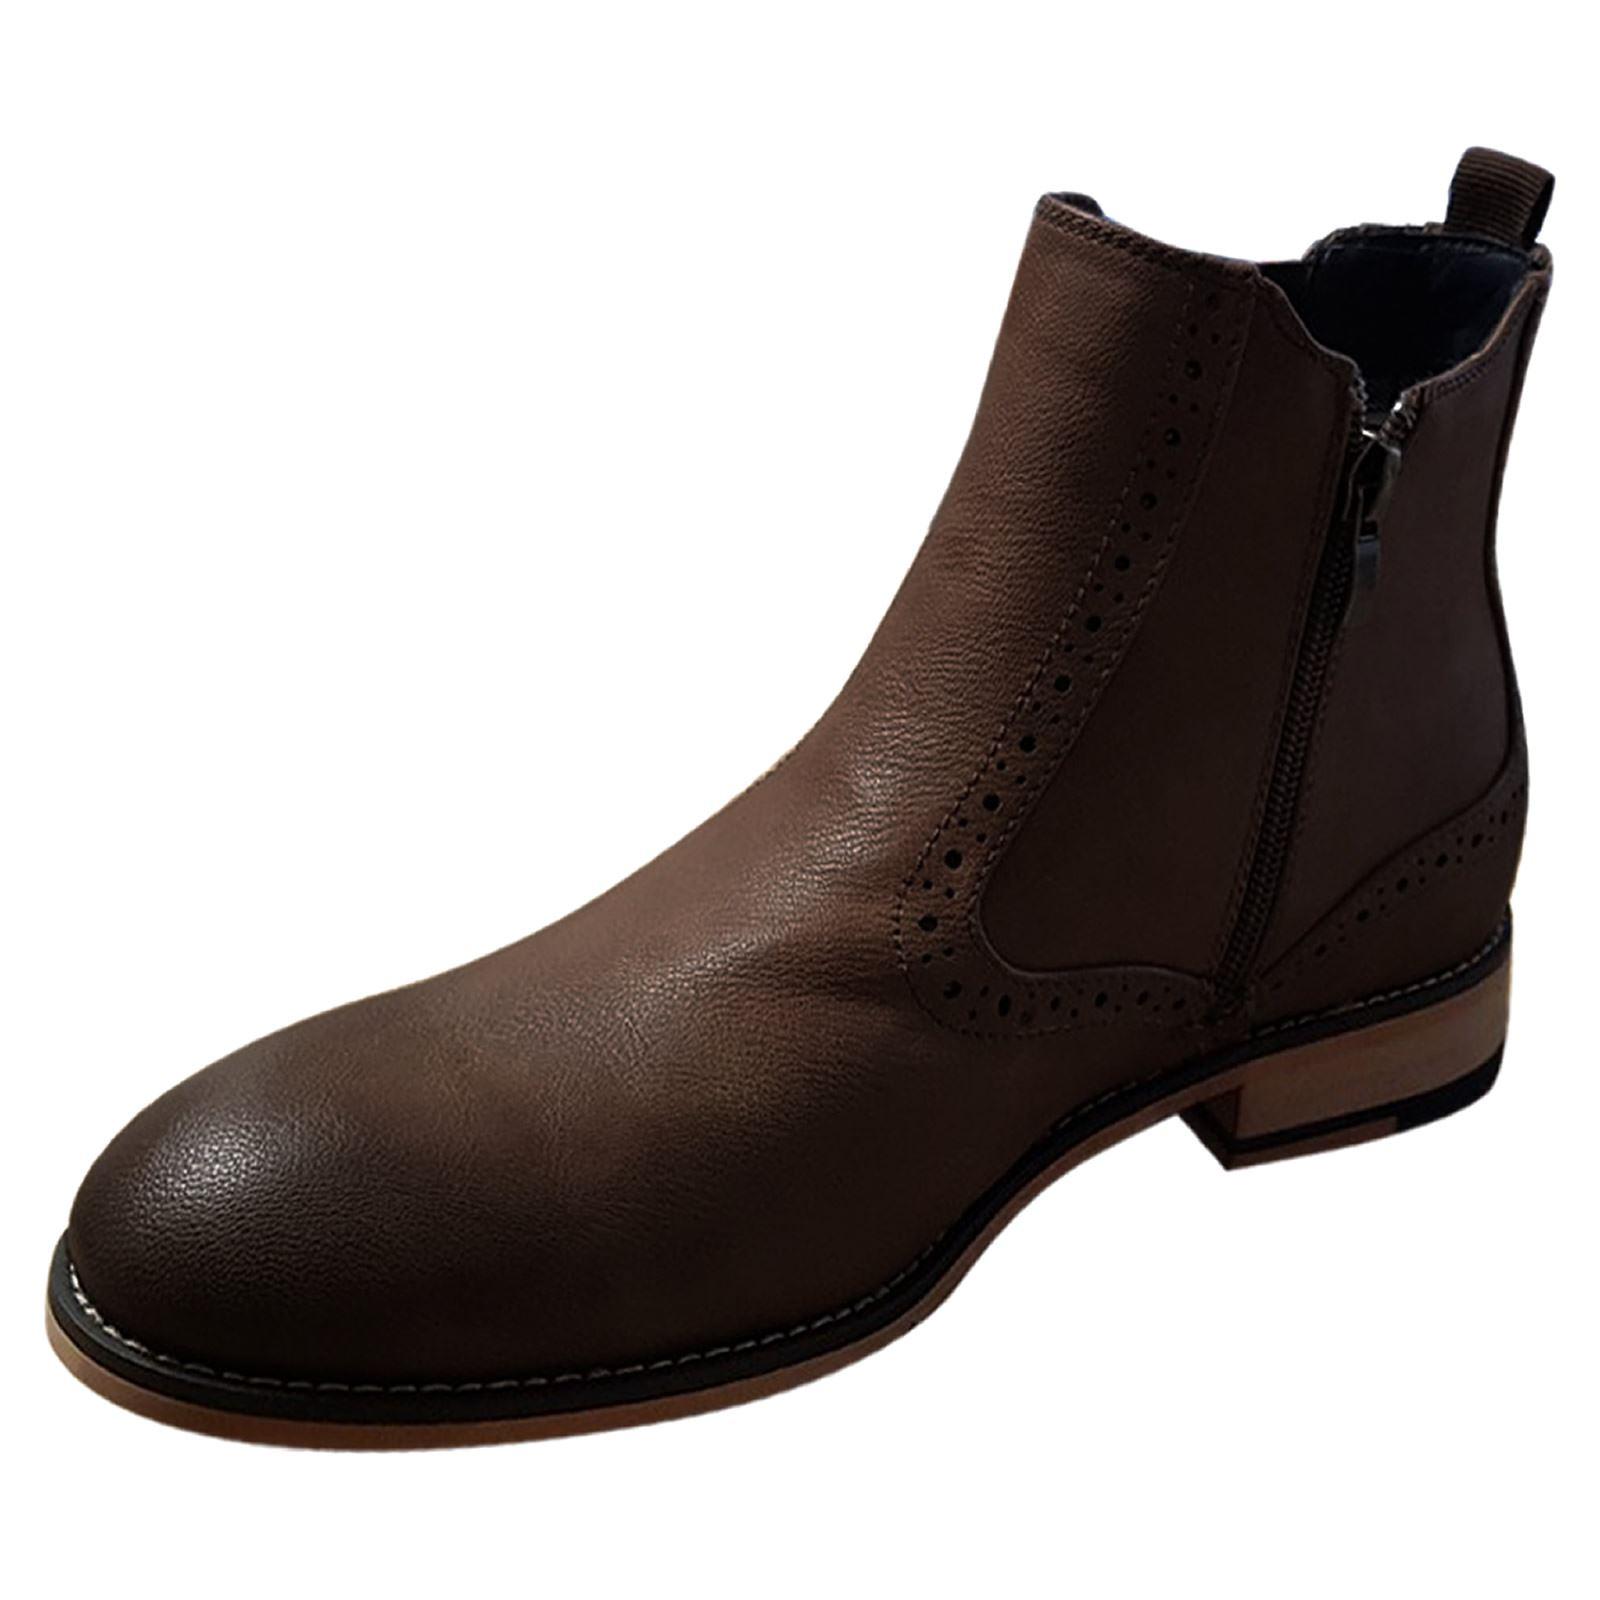 miniature 5 - Homme-Bottines-Chelsea-CAVANI-Fox-Aspect-Cuir-Slip-On-Classic-Mod-Chaussures